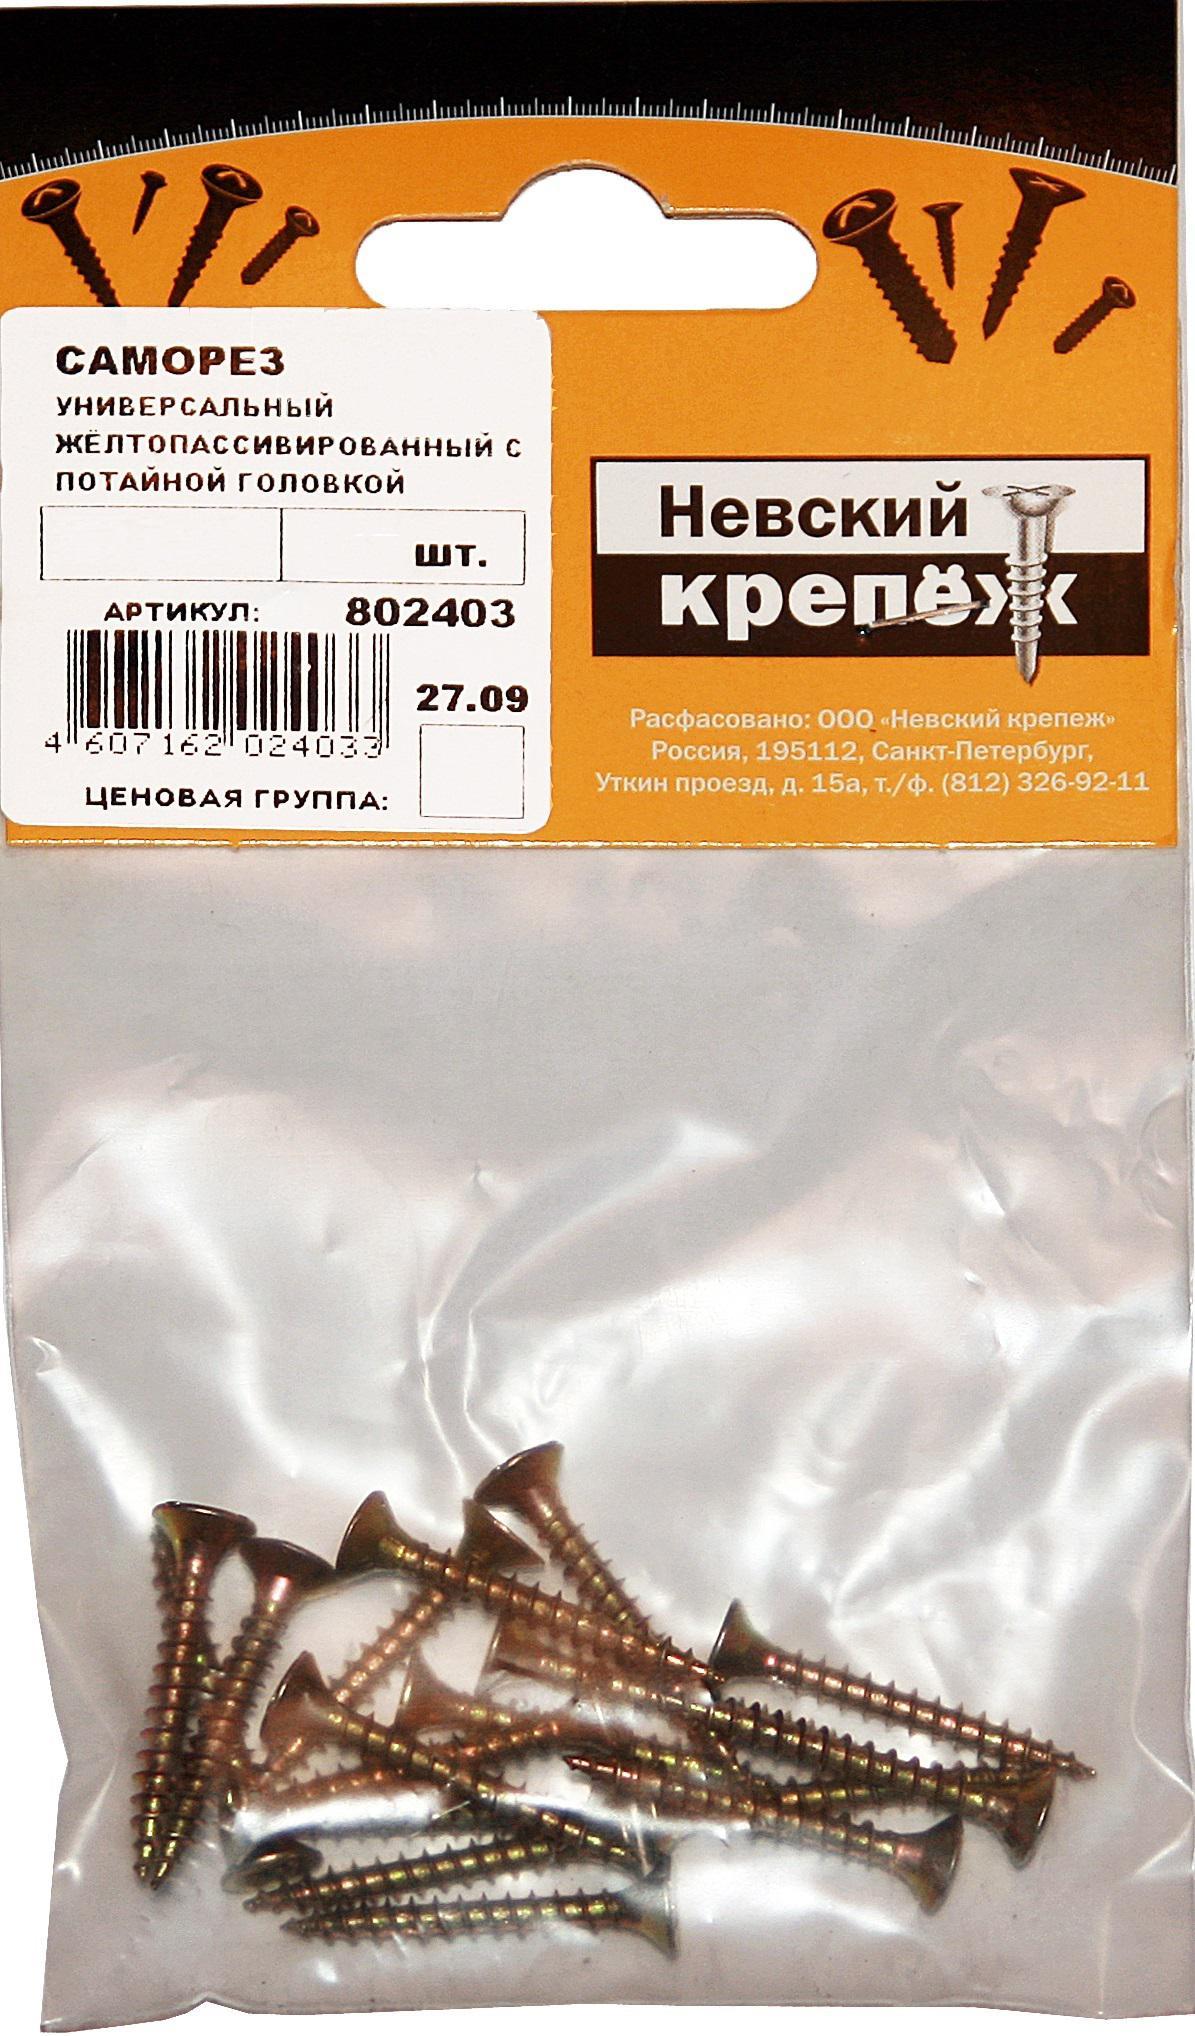 Саморез НЕВСКИЙ КРЕПЕЖ 802400